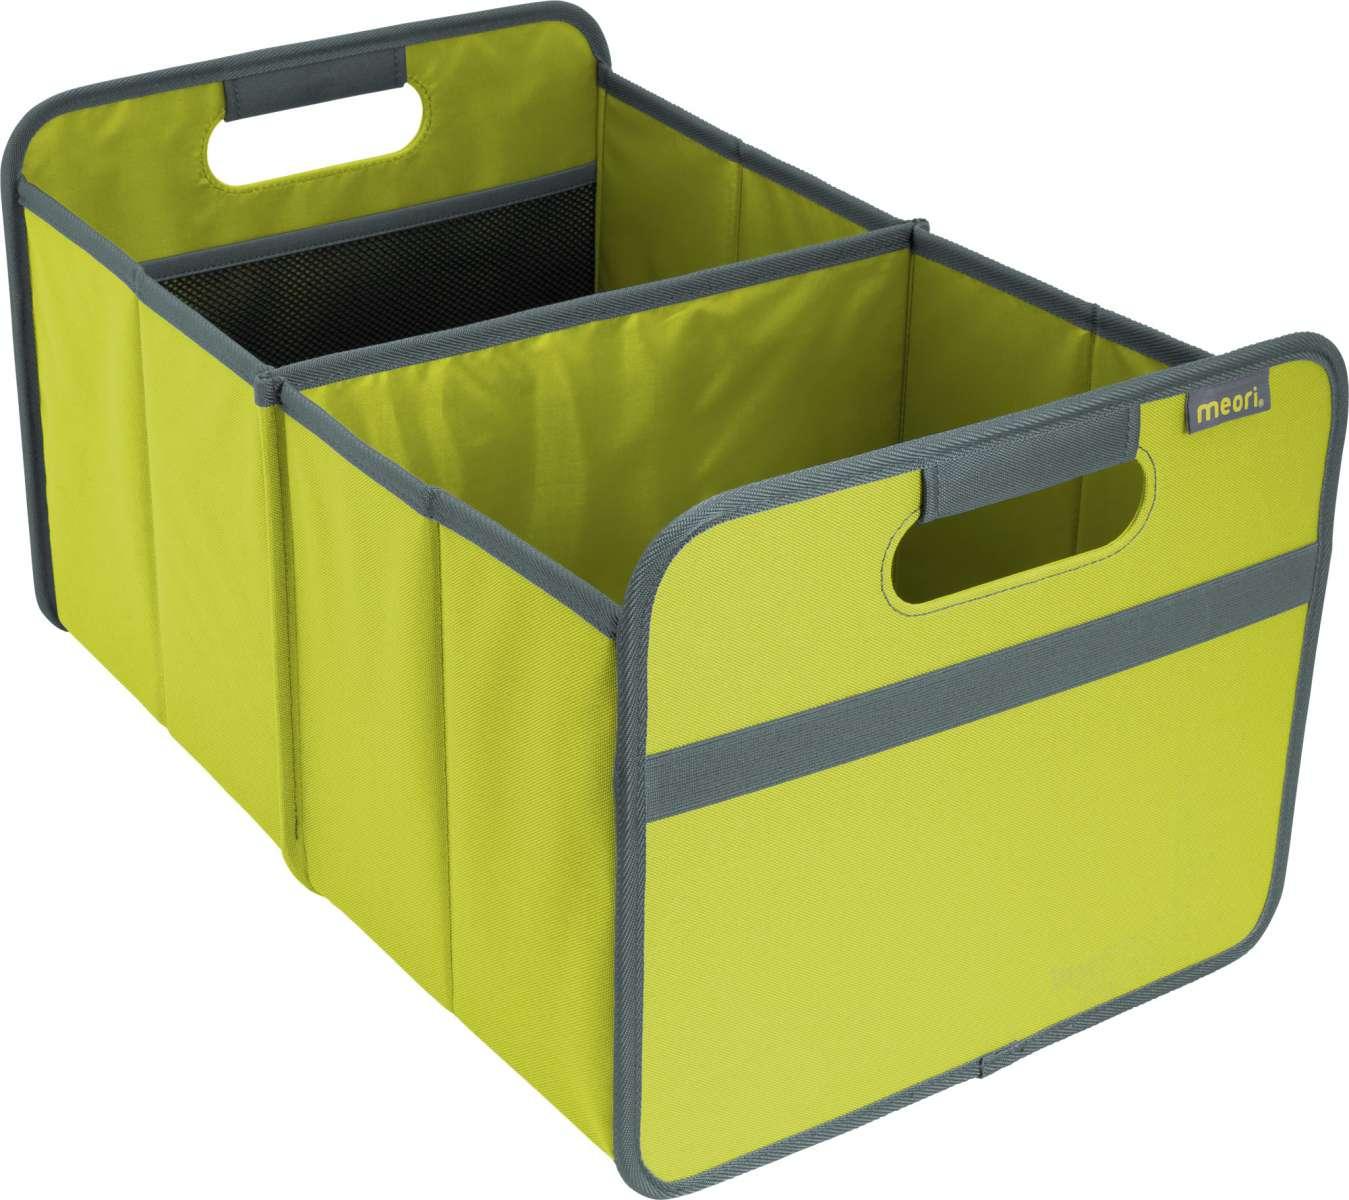 Meori Faltbox Classic Kiwi Grün Large